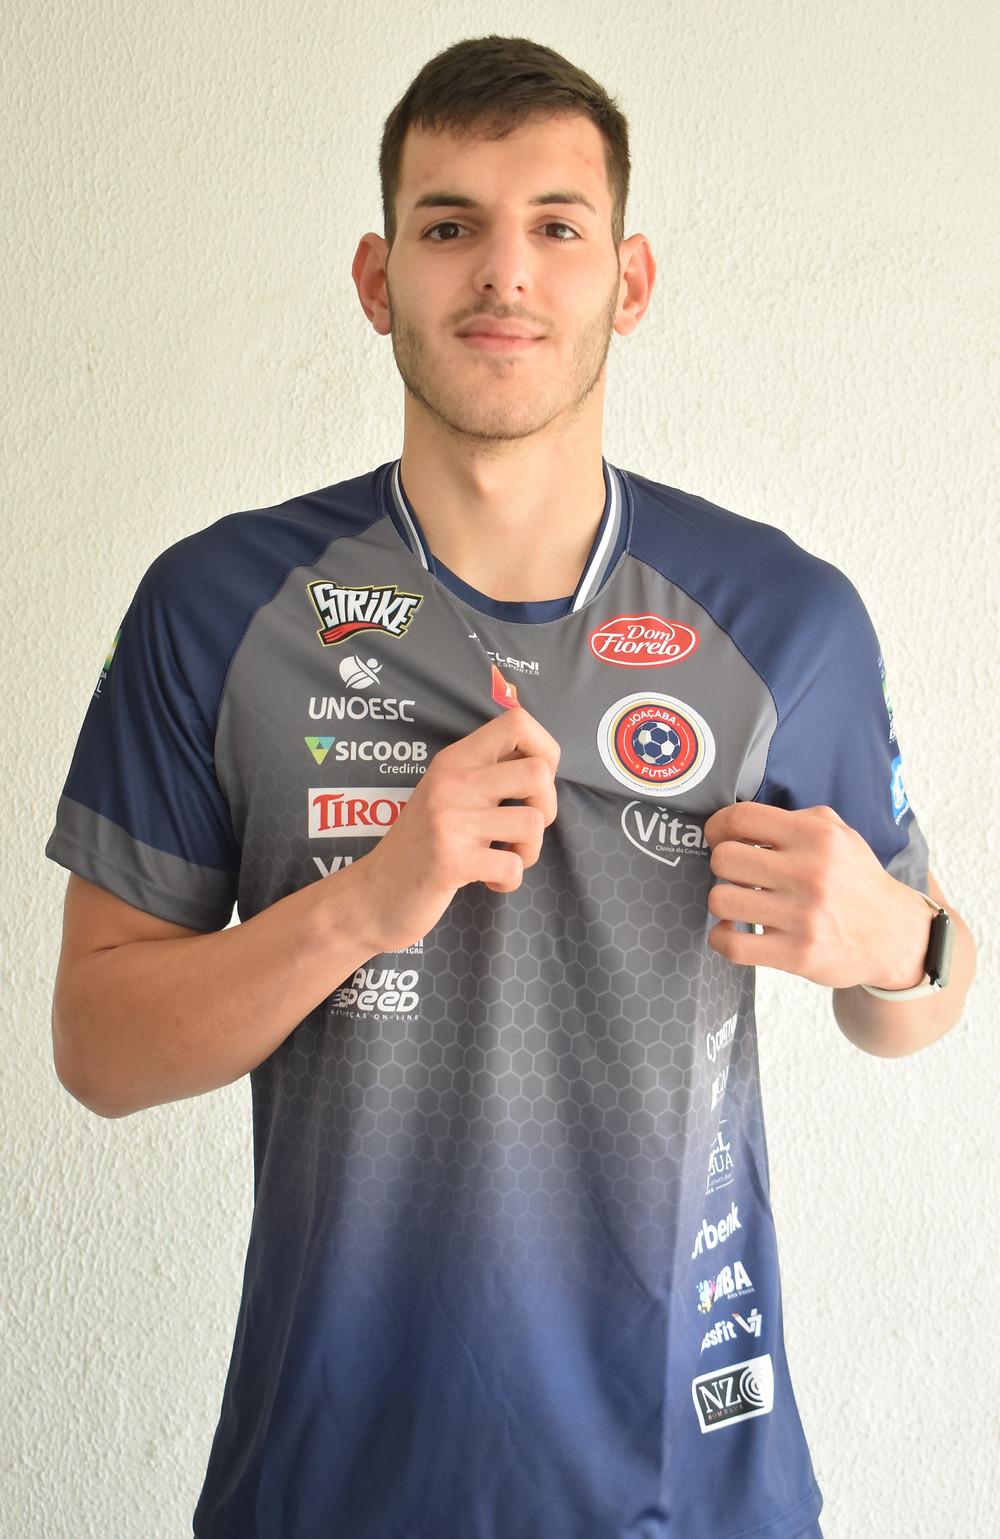 Crédito: Mayelle Hall - Tiago Loose reforça a equipe para a LNF, Paranaense e Taça Brasil Siccredi